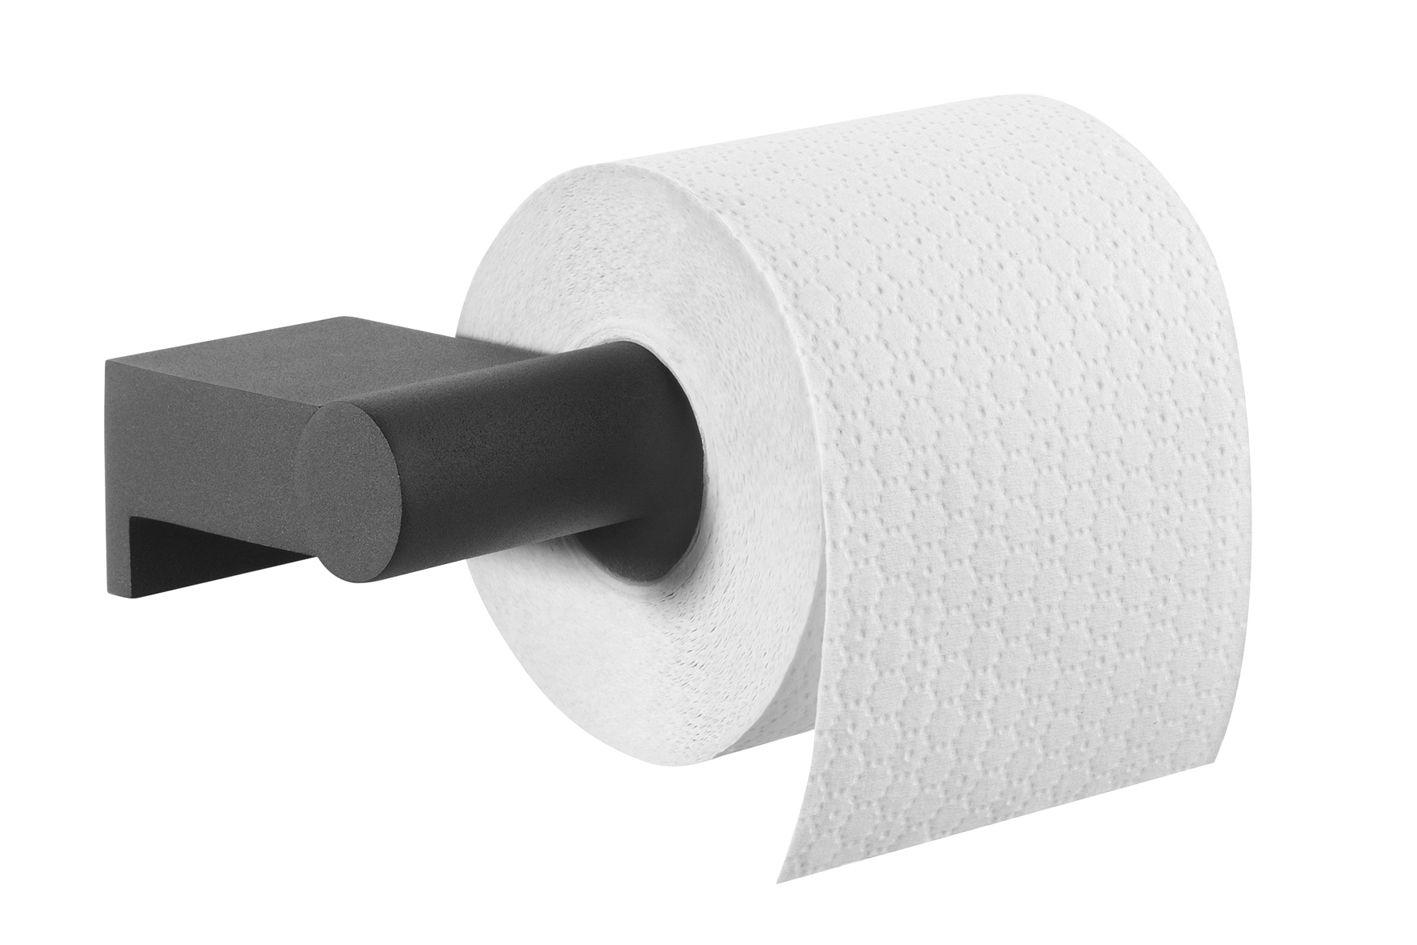 Tiger Bold toiletrolhouder zwart